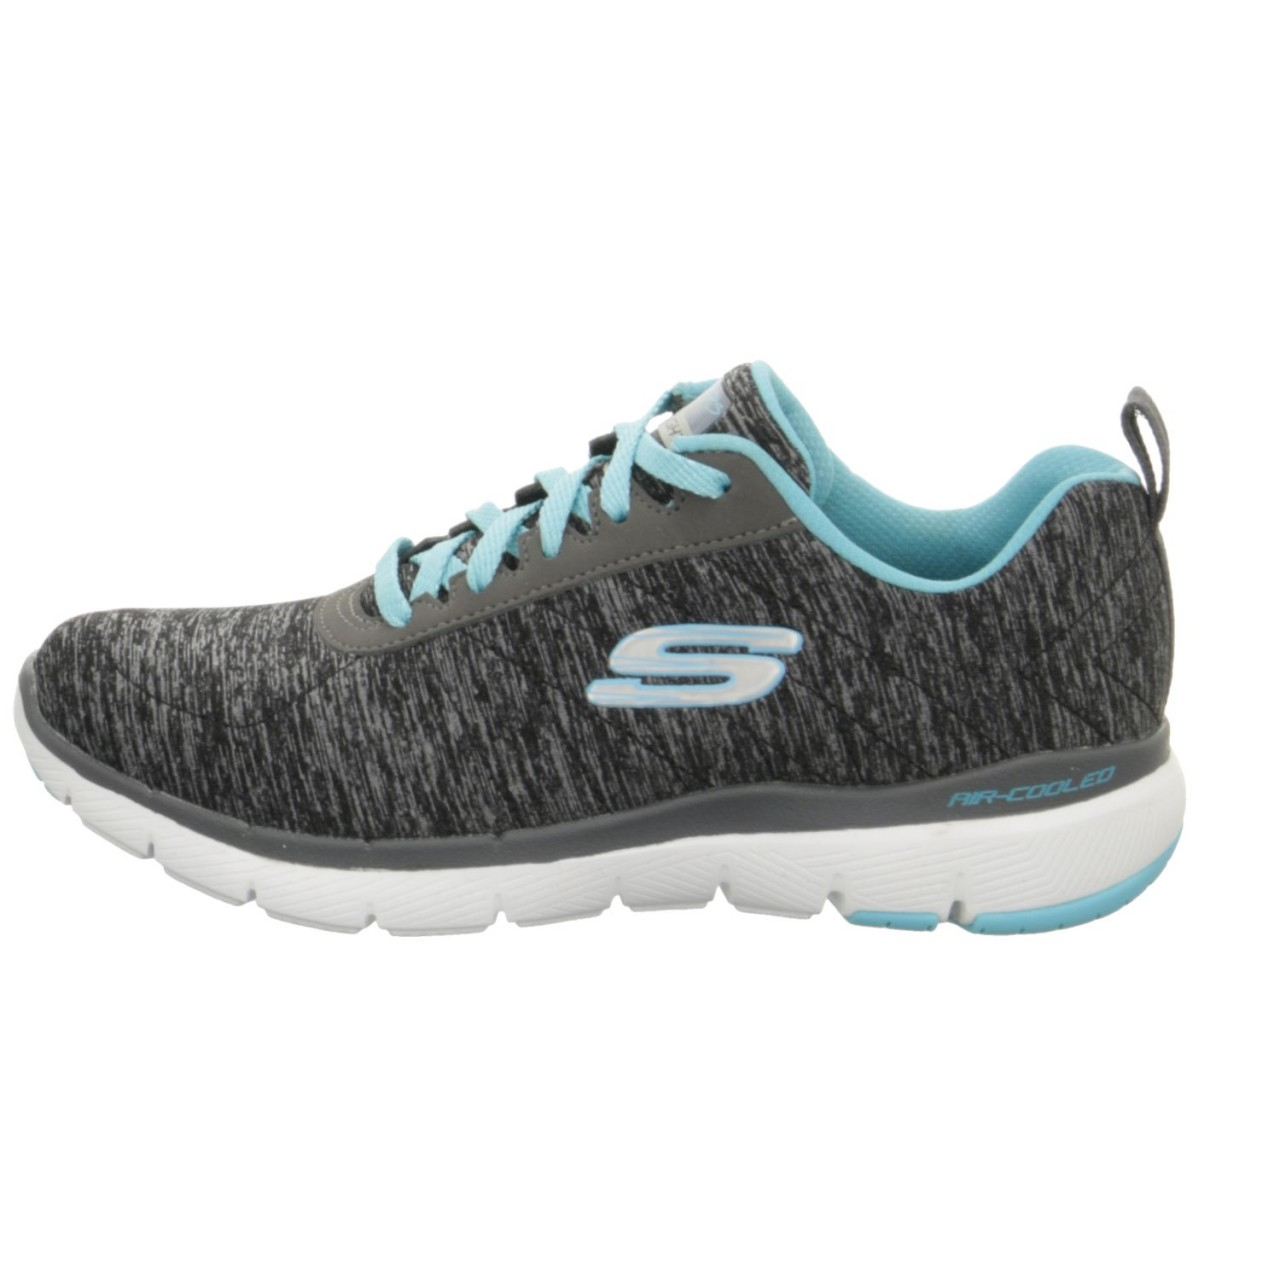 Skechers Sneaker Frauen 13067 BKLB BKLB grau p8vNJU